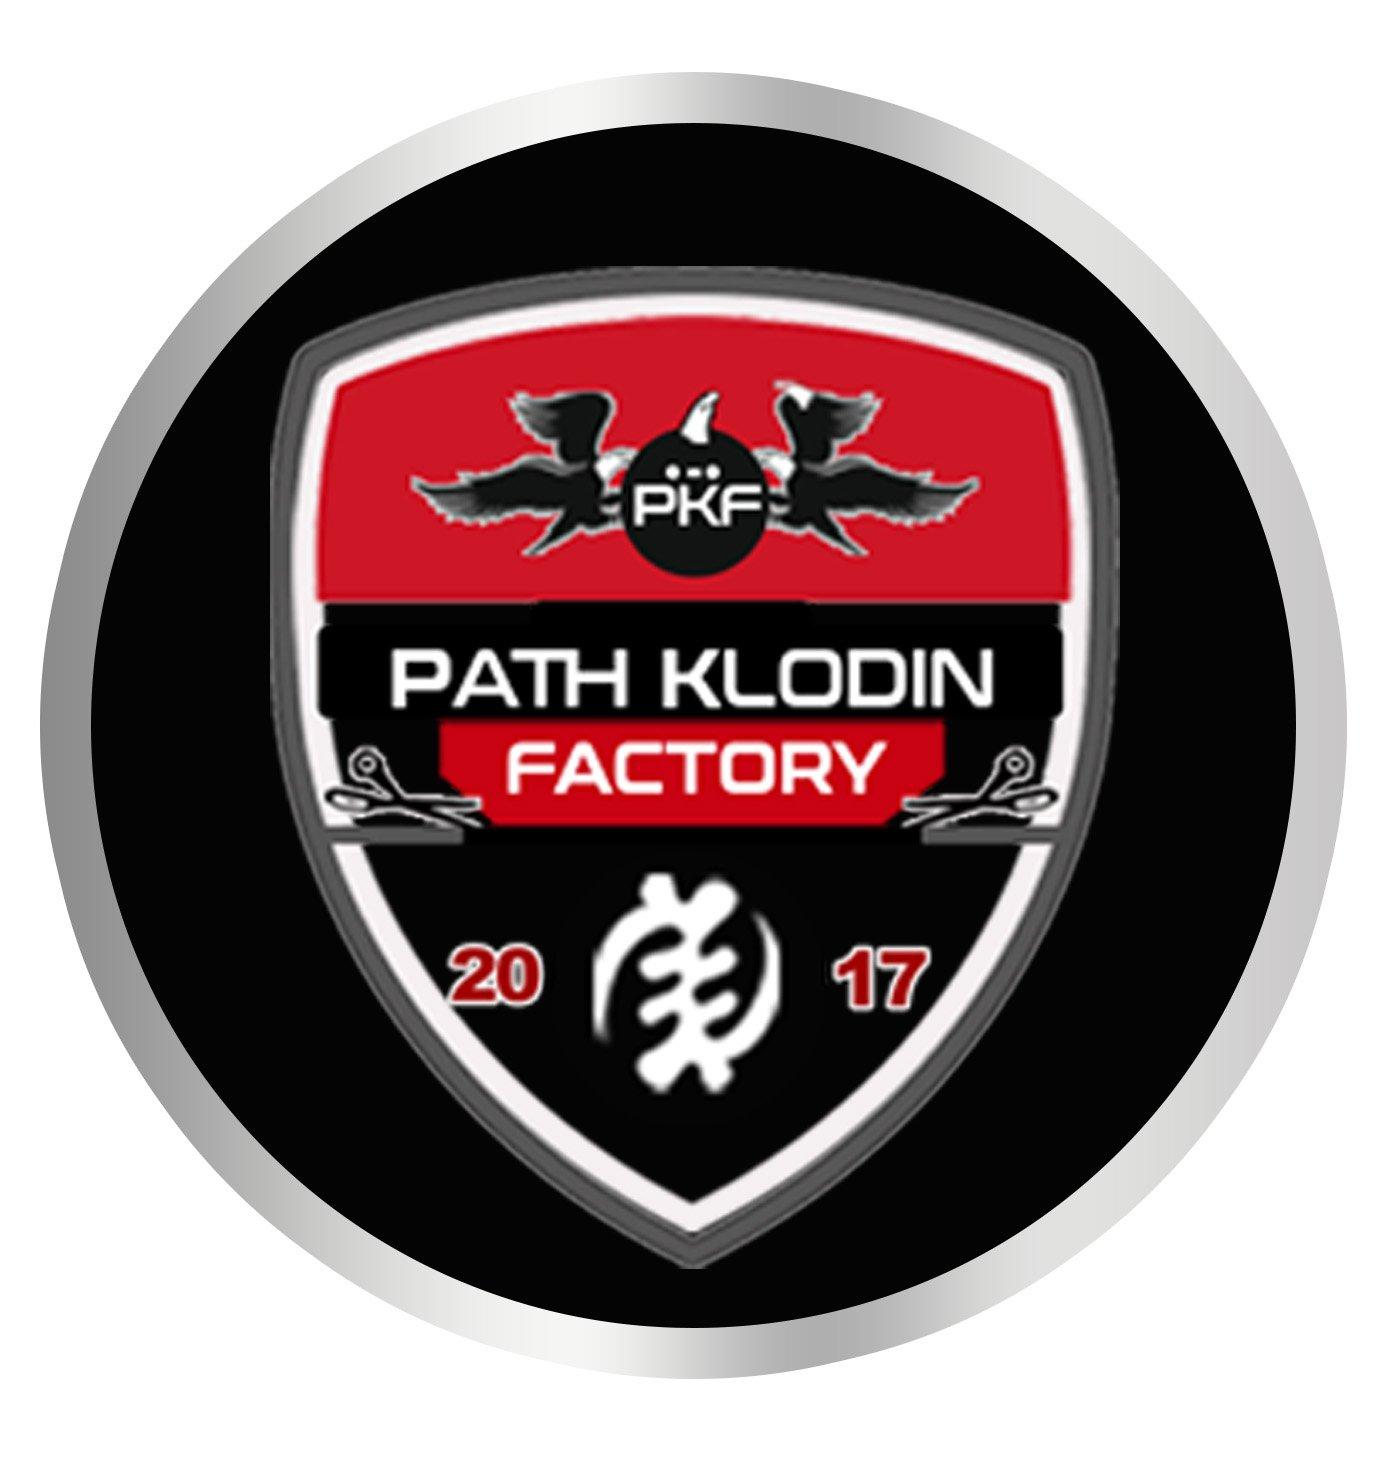 PATH KLODIN FACTORY